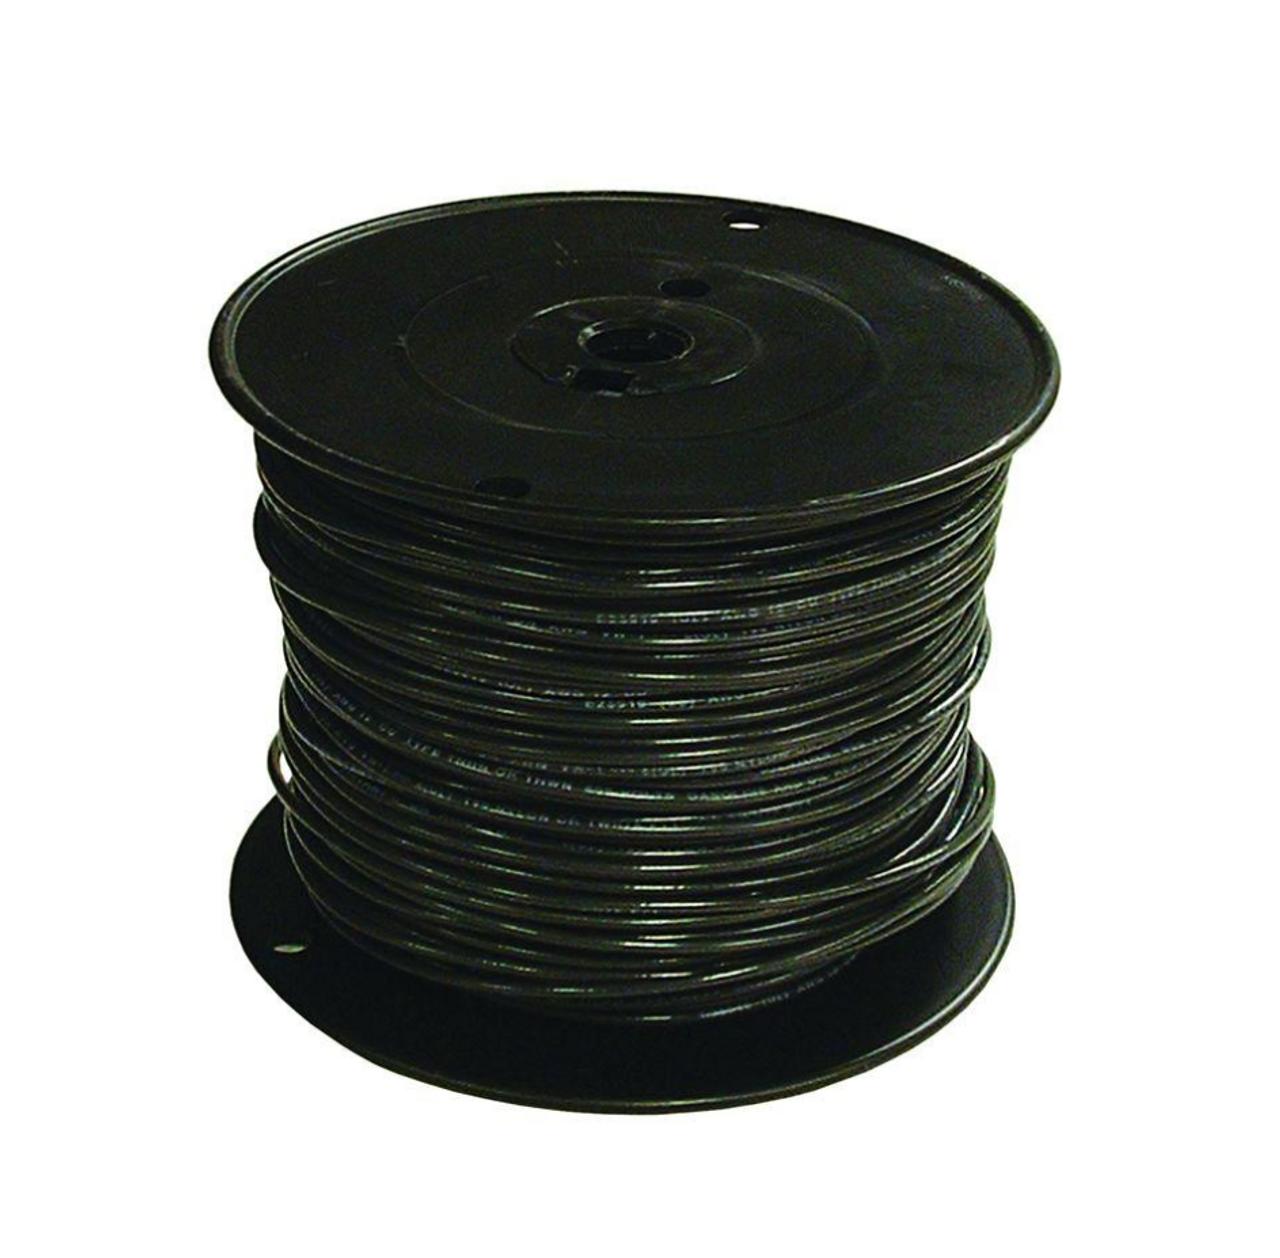 Tracer Wire - #6 Solid Copper Black Jacket 500' Reel - SW GA PESOH6